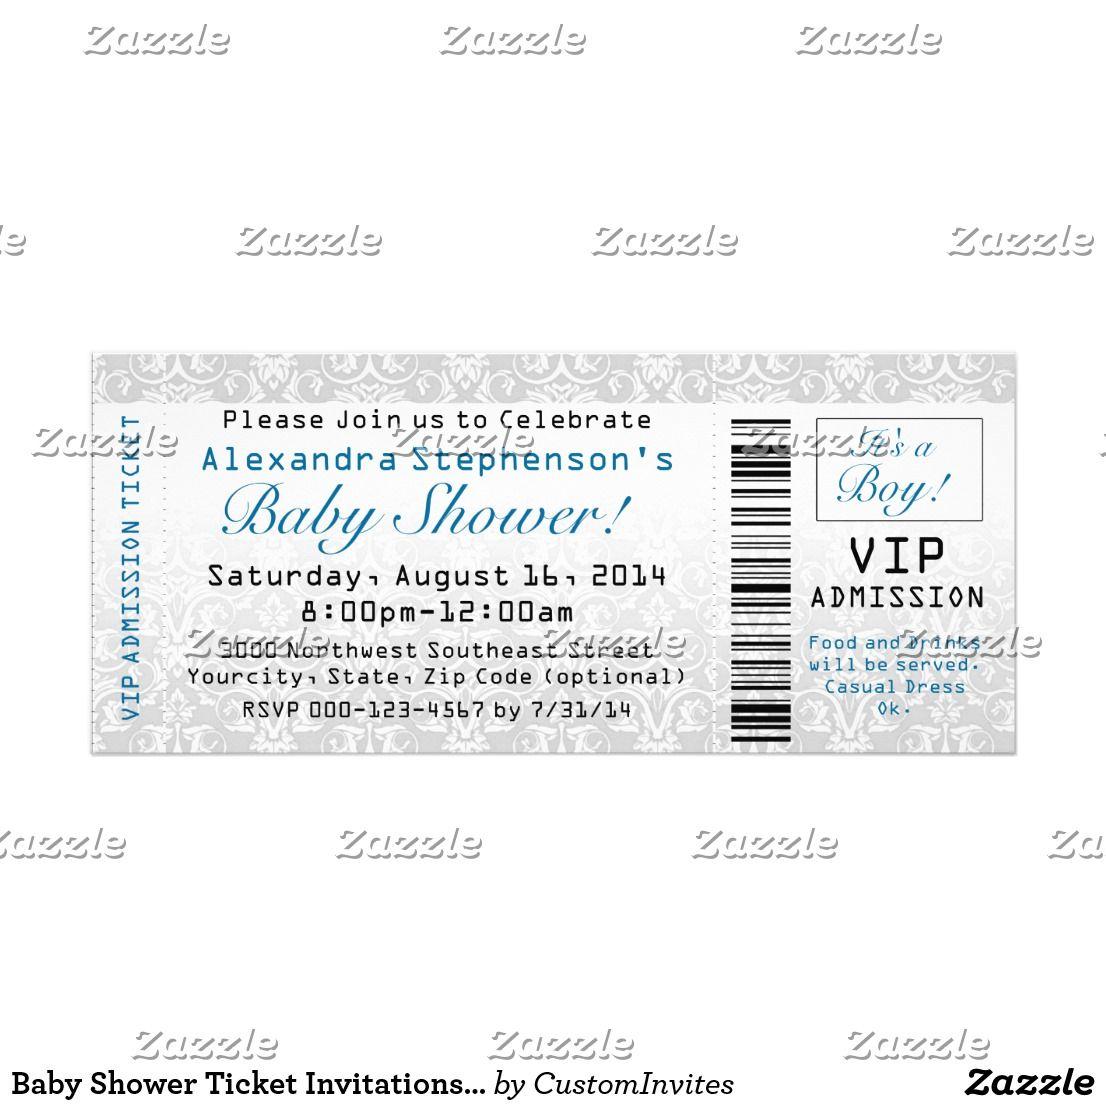 Baby Shower Ticket Invitations, Boy Card   Ticket invitation